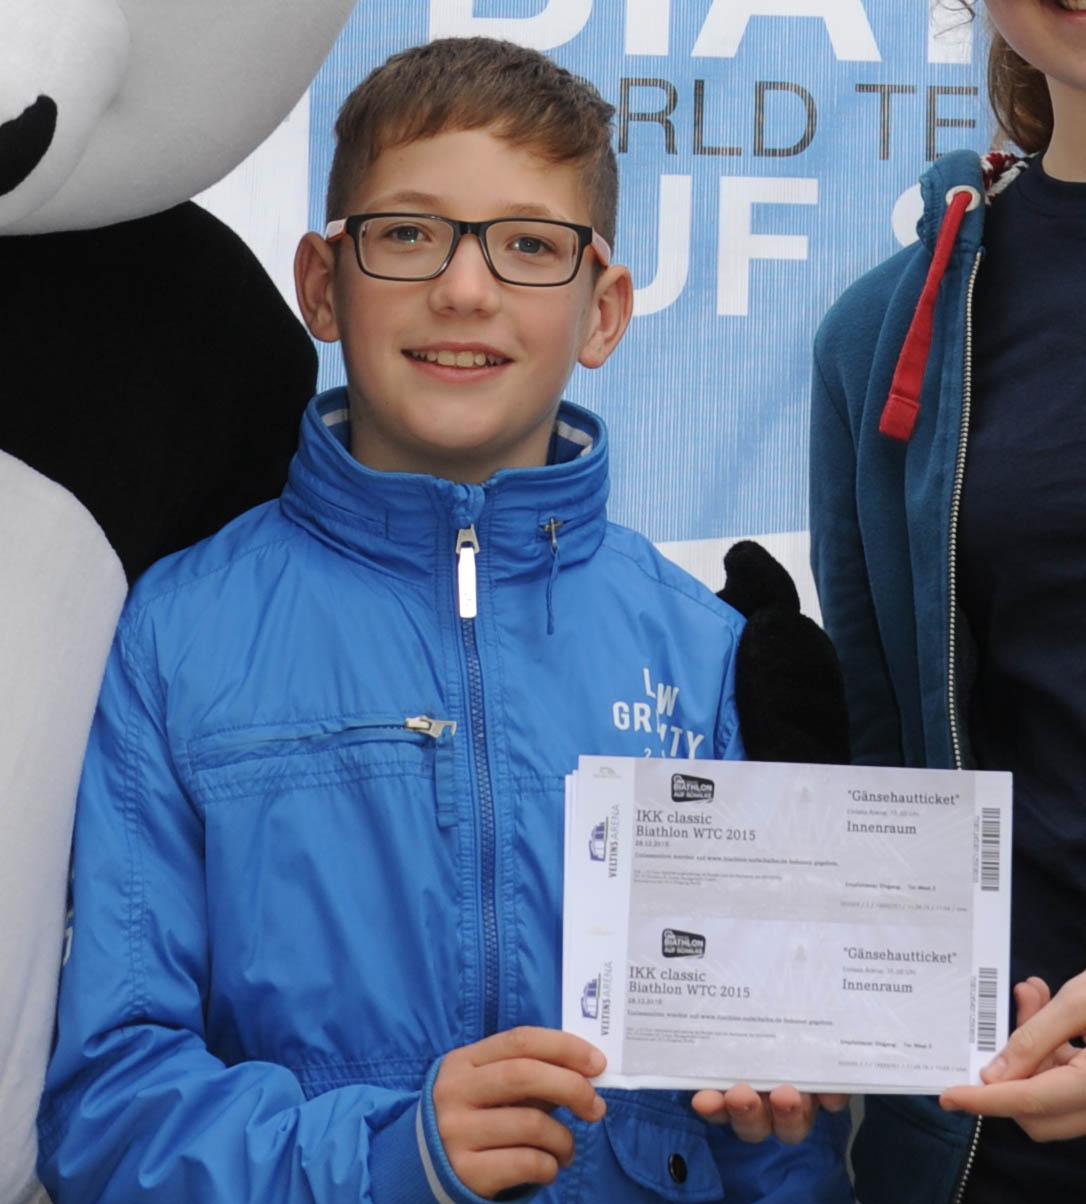 https://www.biathlon-tour.de/wp-content/uploads/2015/03/Alexander_Portr%C3%A4t.jpg